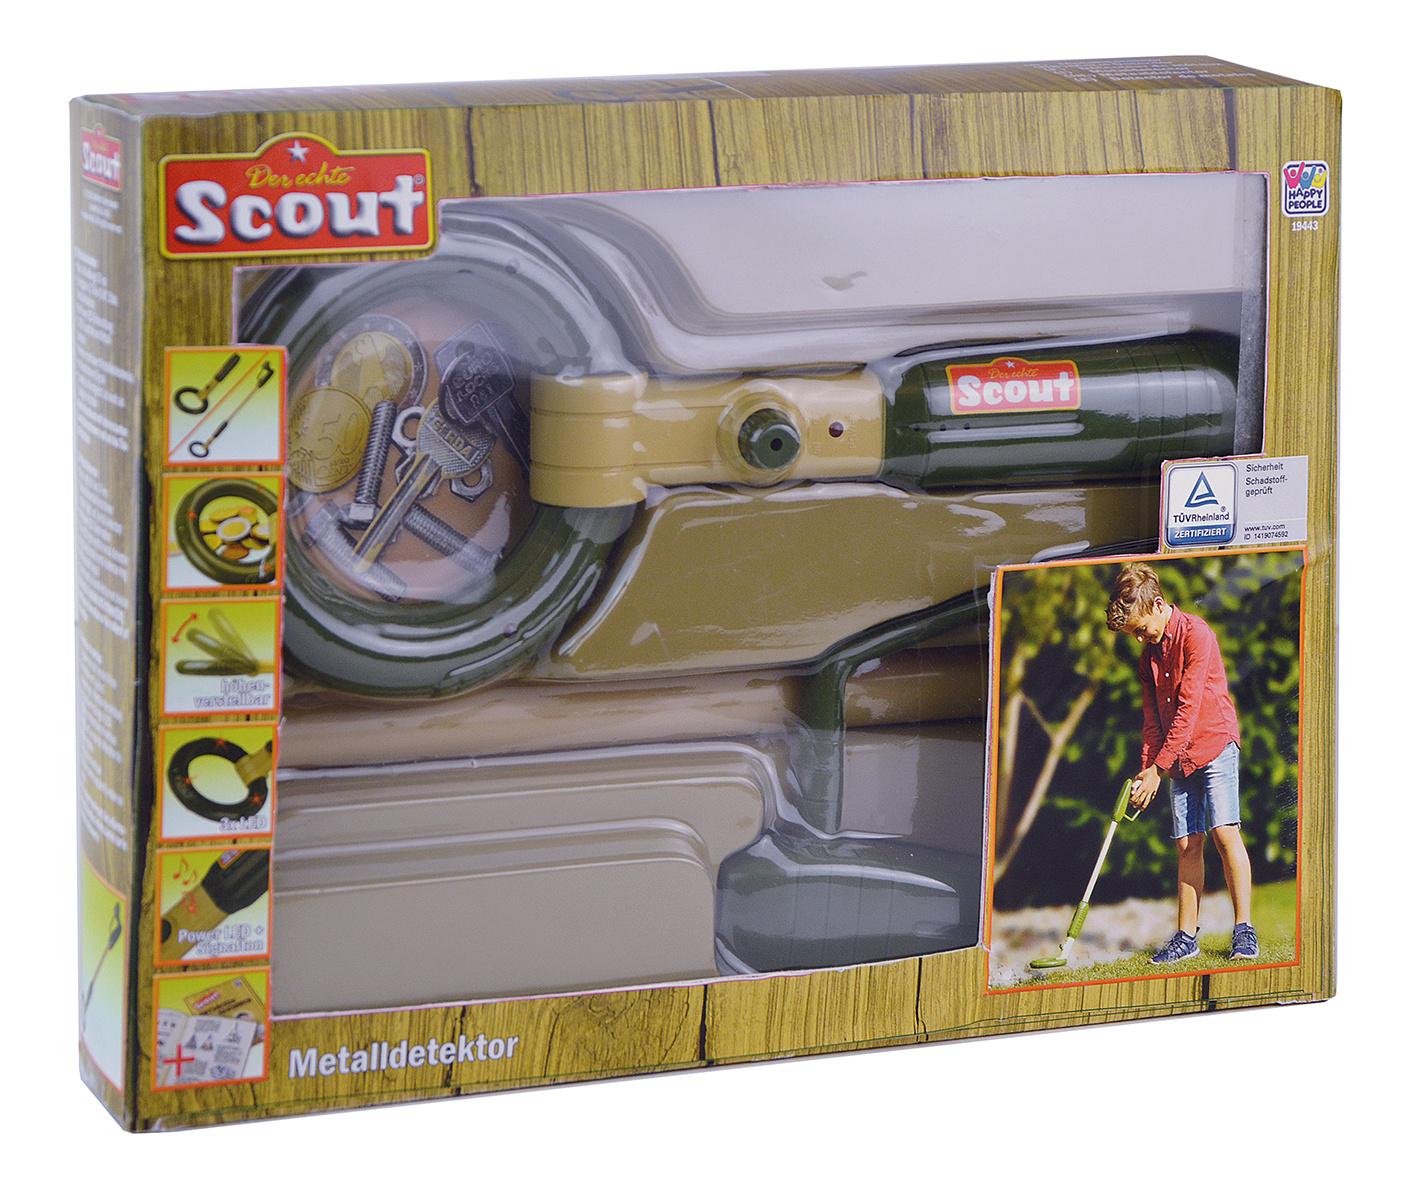 Scout - Metaldetektor